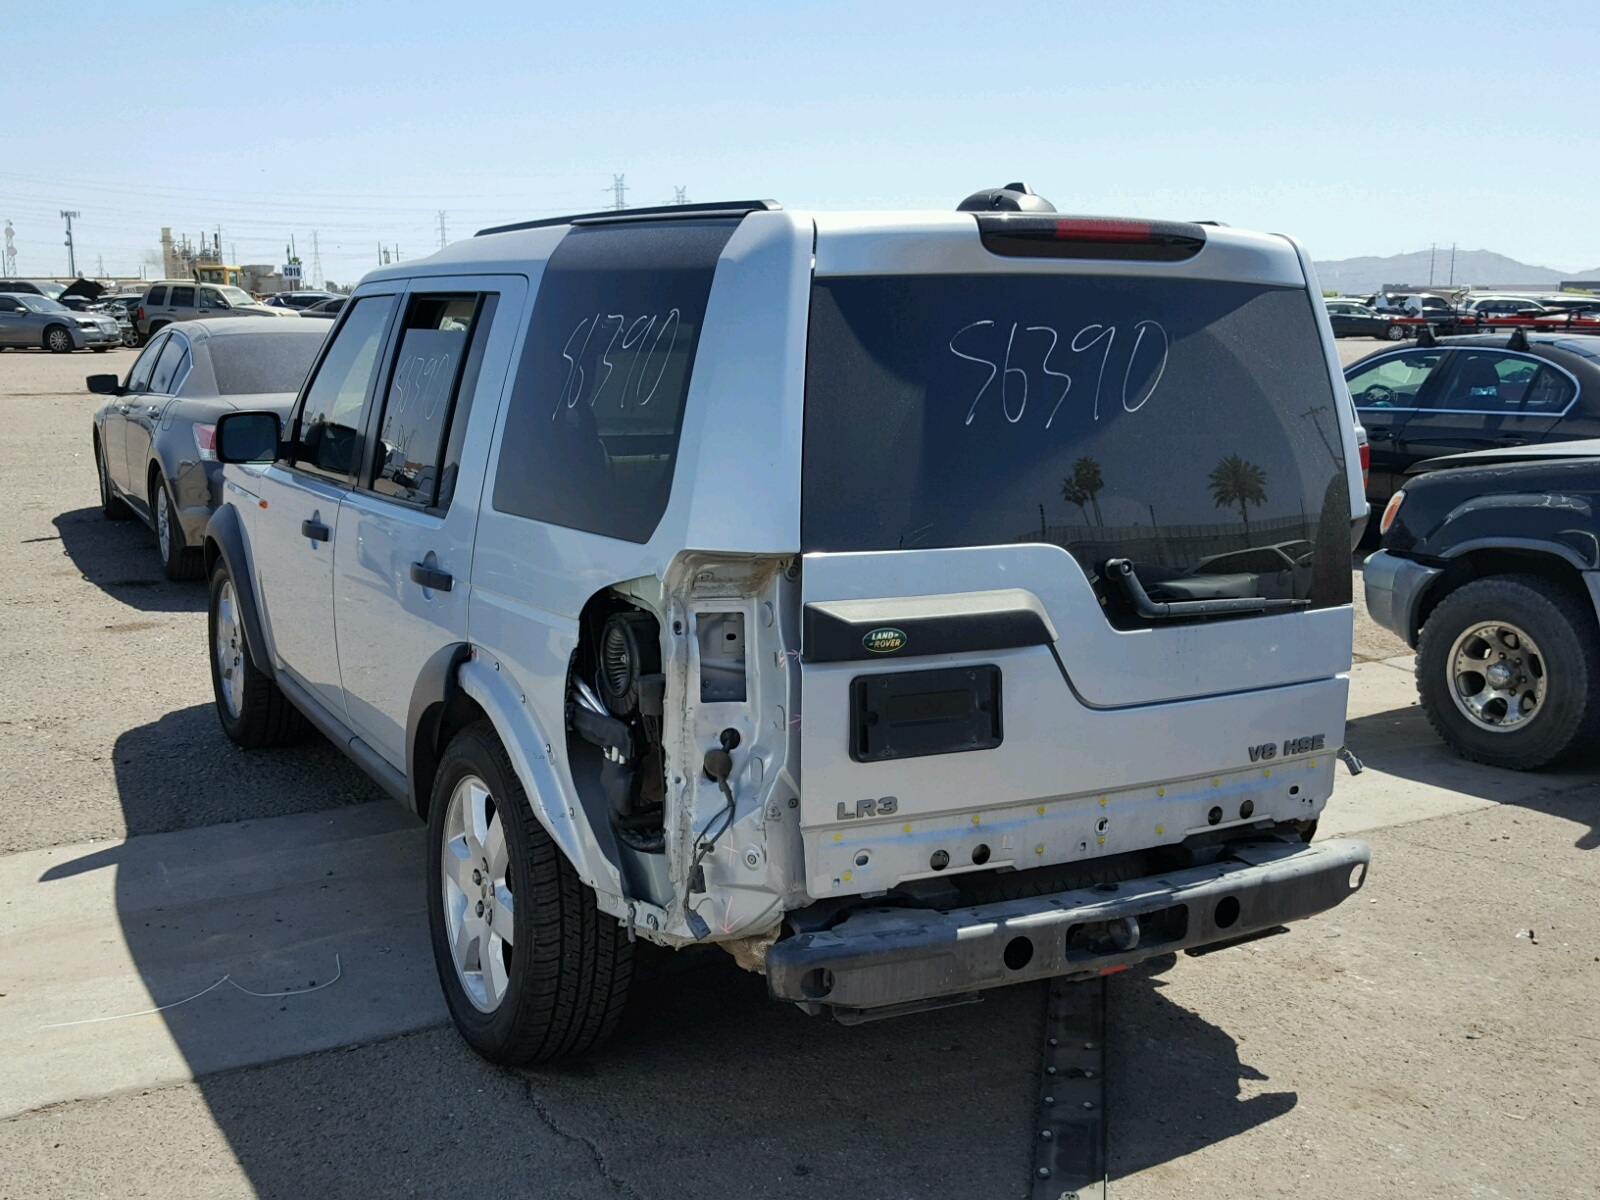 on carfinder auction vin rove sale ca lot en auto junk for hayward copart hse range auctions land ended rover receipt landrover online